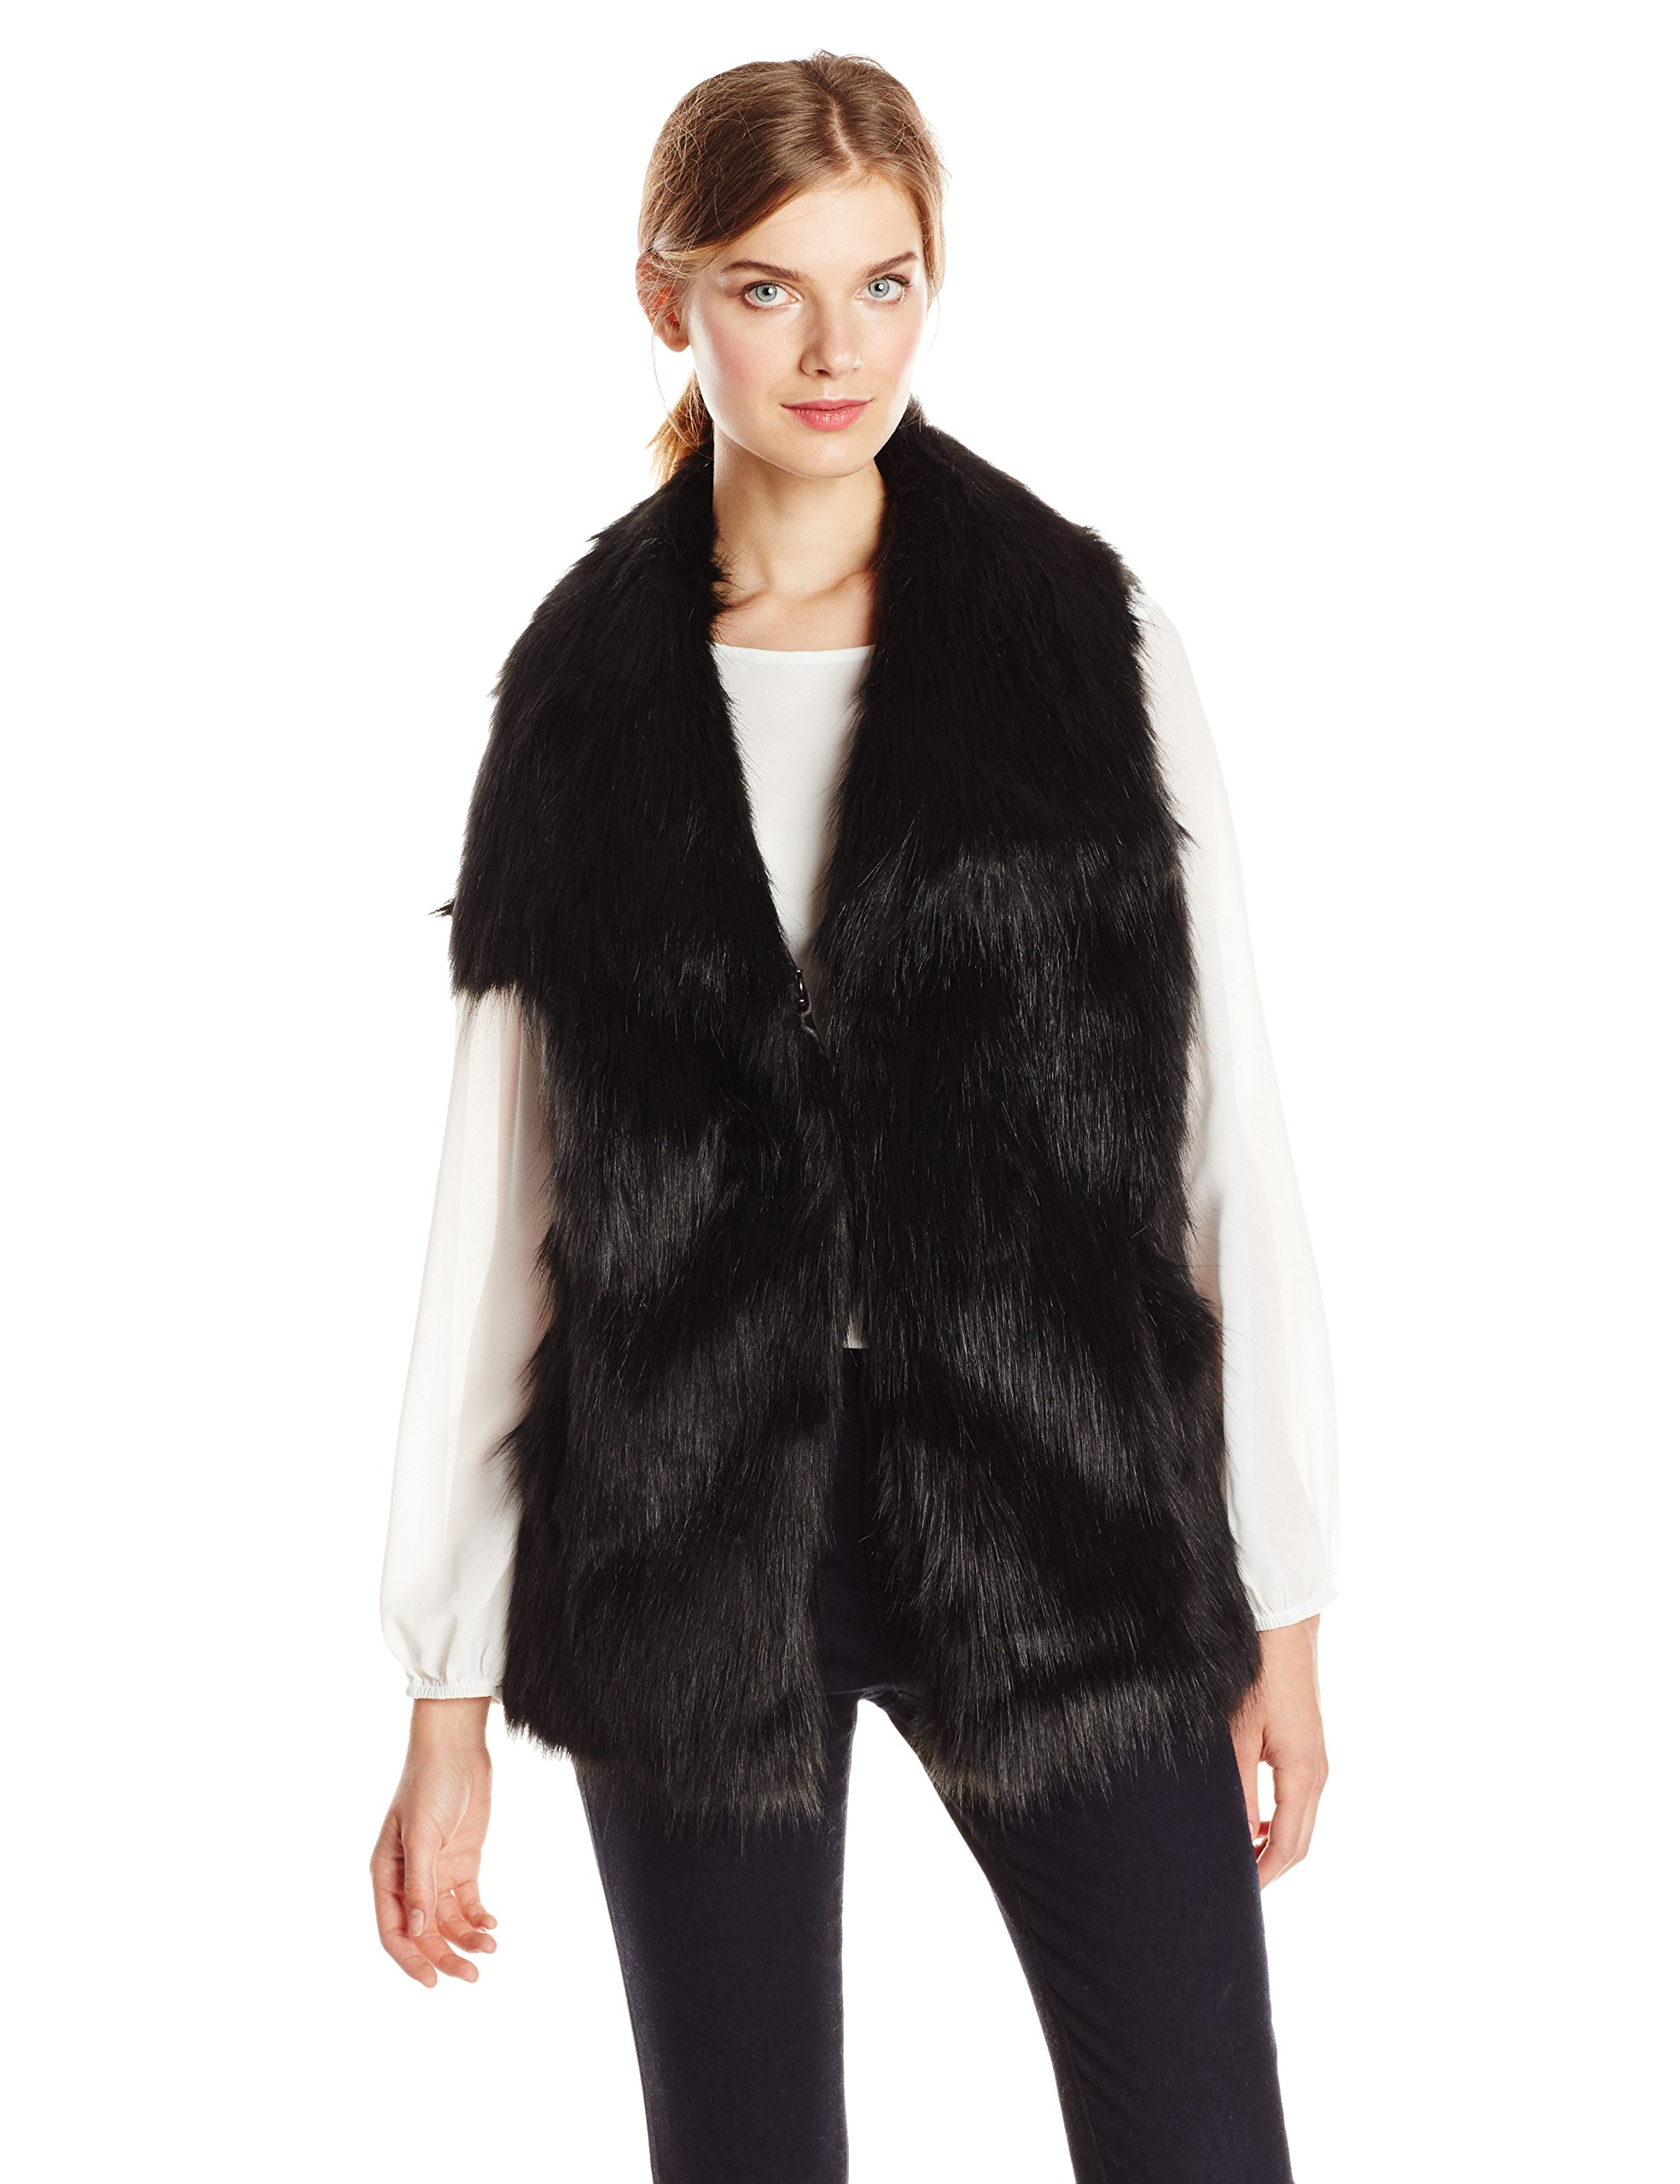 Via Spiga Women's Faux Fur Vest, Black, Small